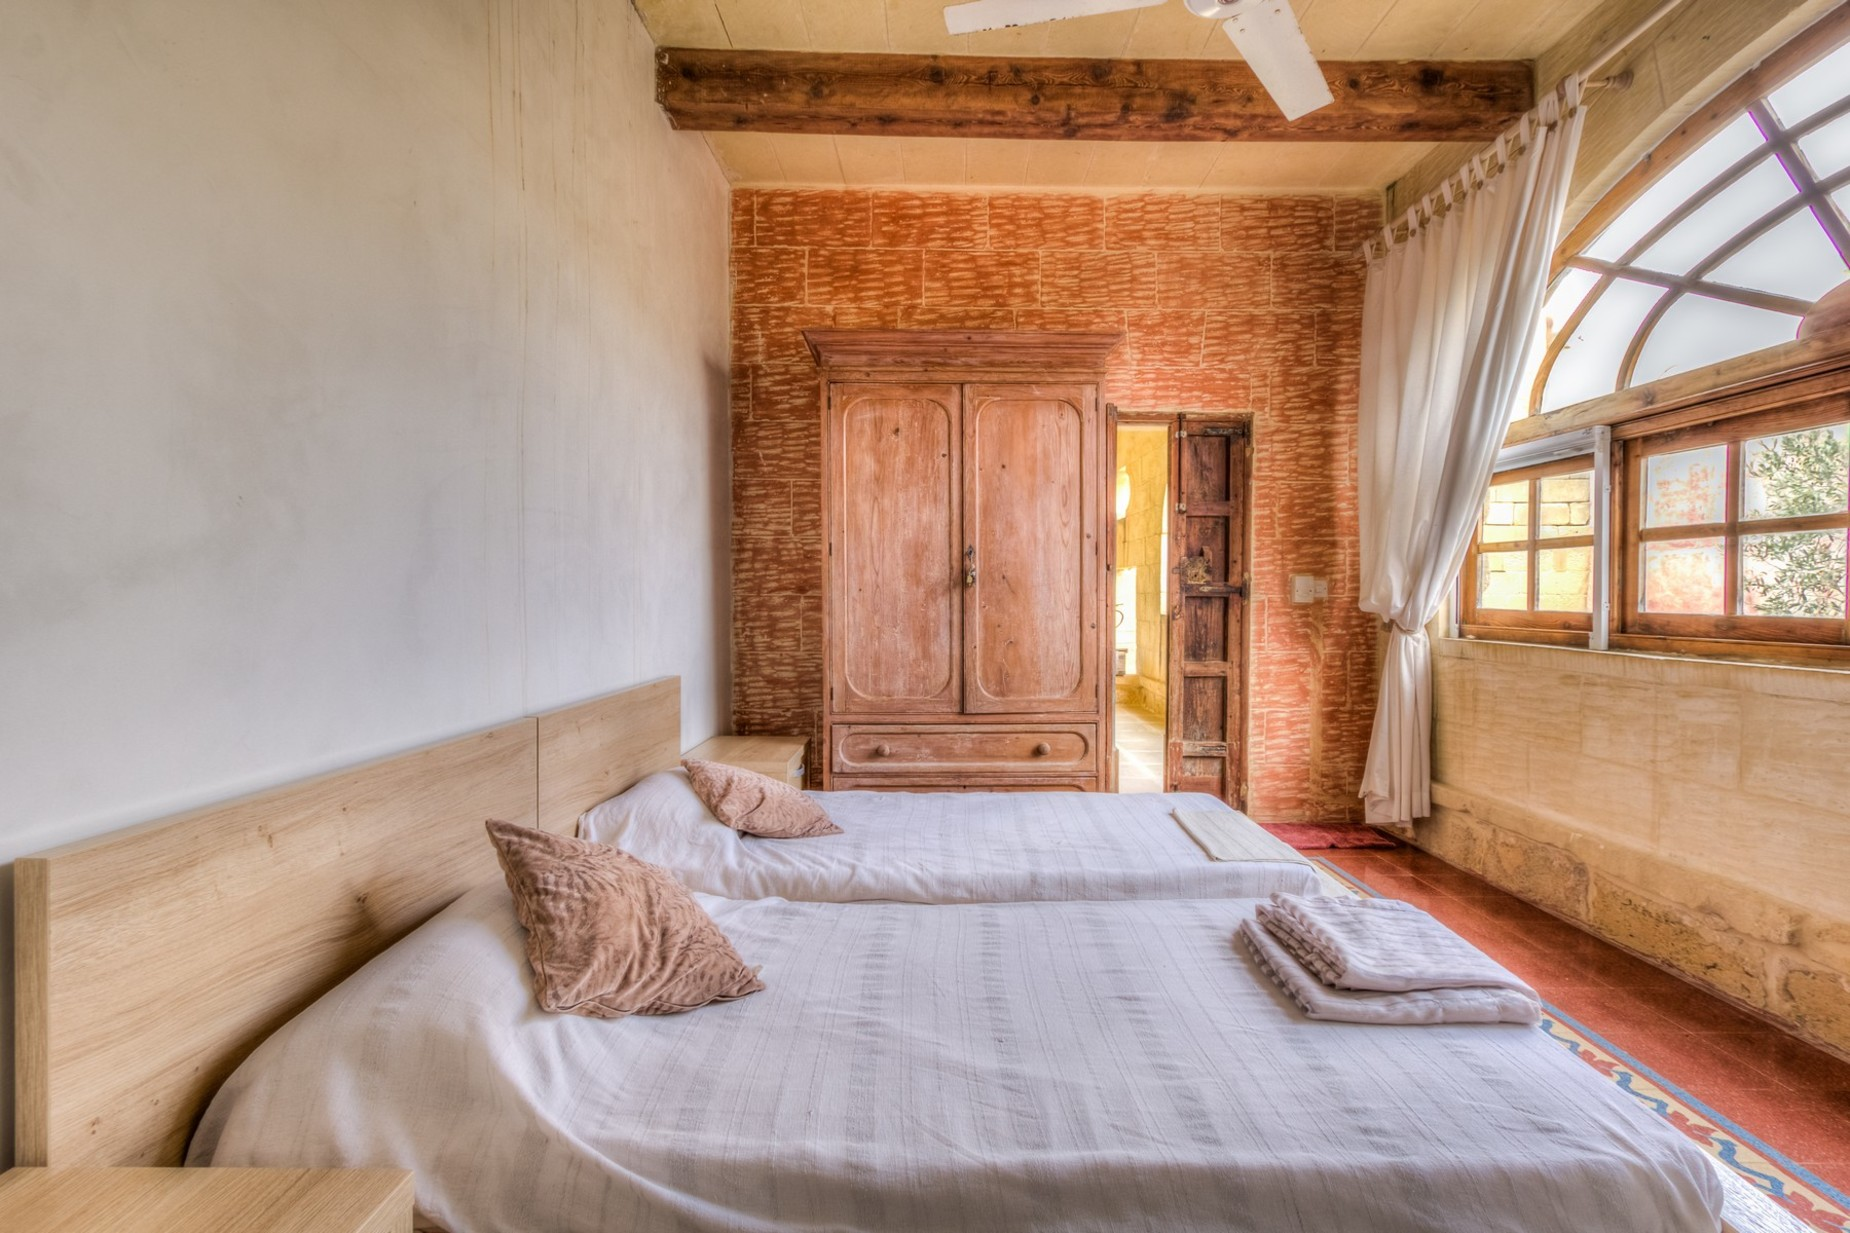 6 bed Farmhouse For Sale in San Lawrenz, San Lawrenz - thumb 19